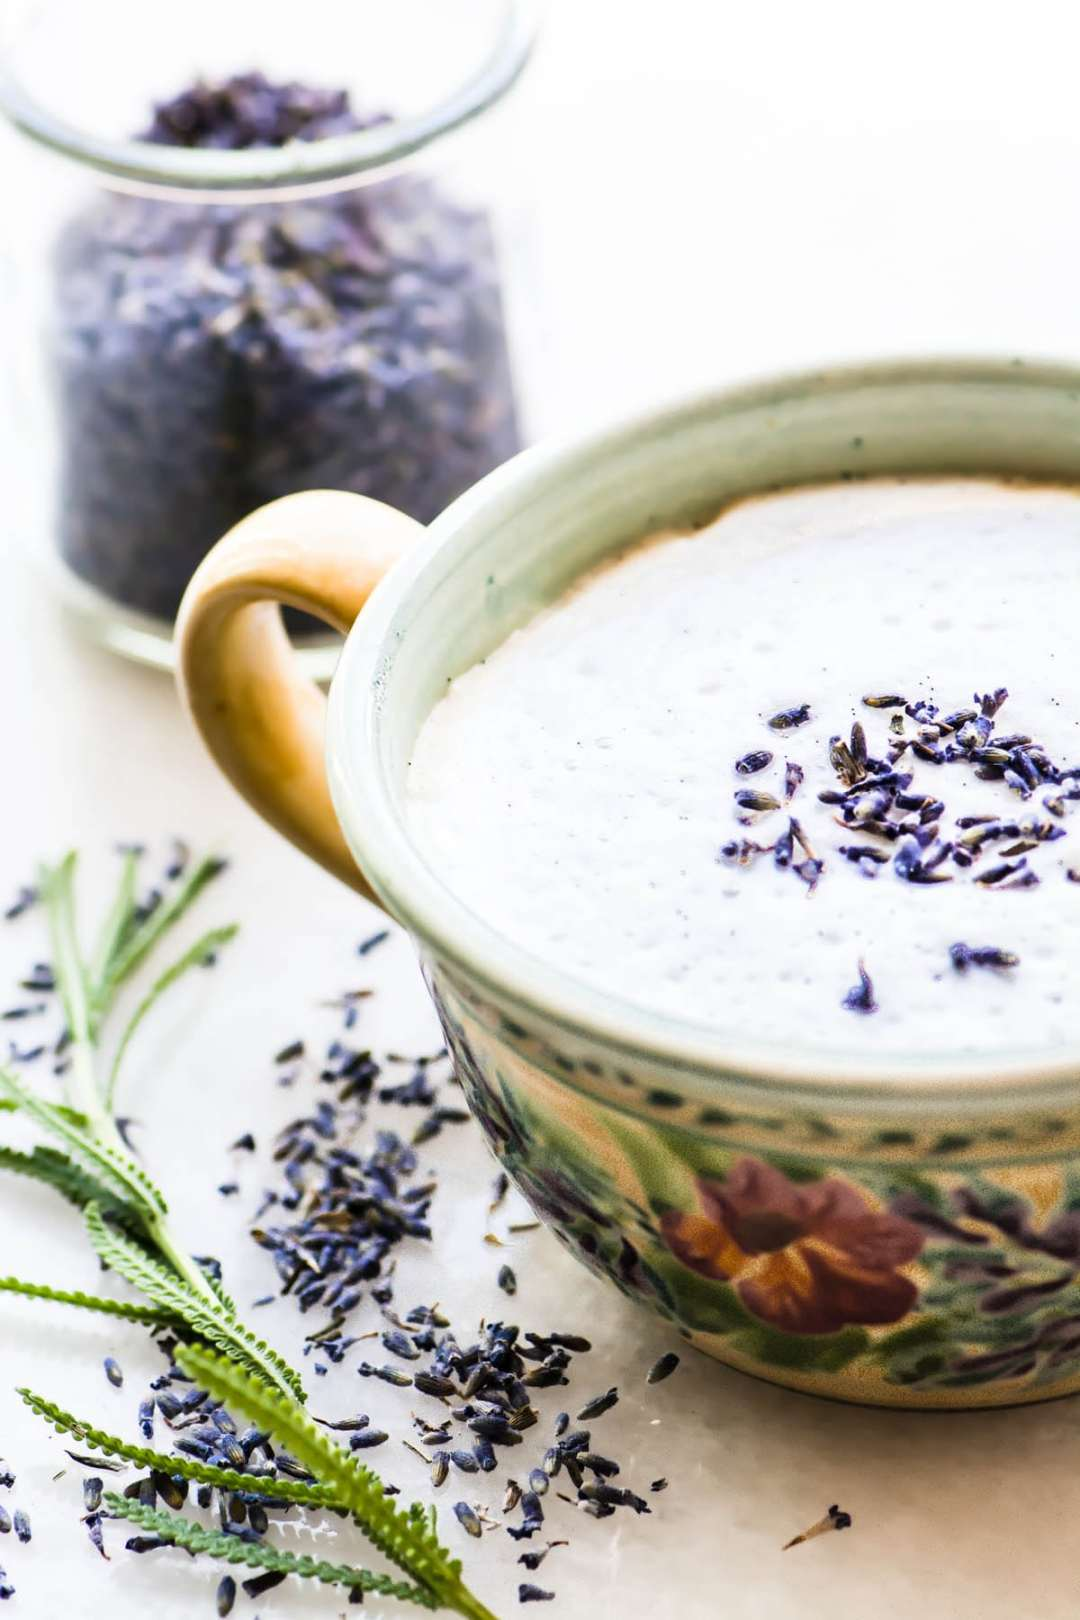 Vanilla lavender latte with fresh lavender sprig